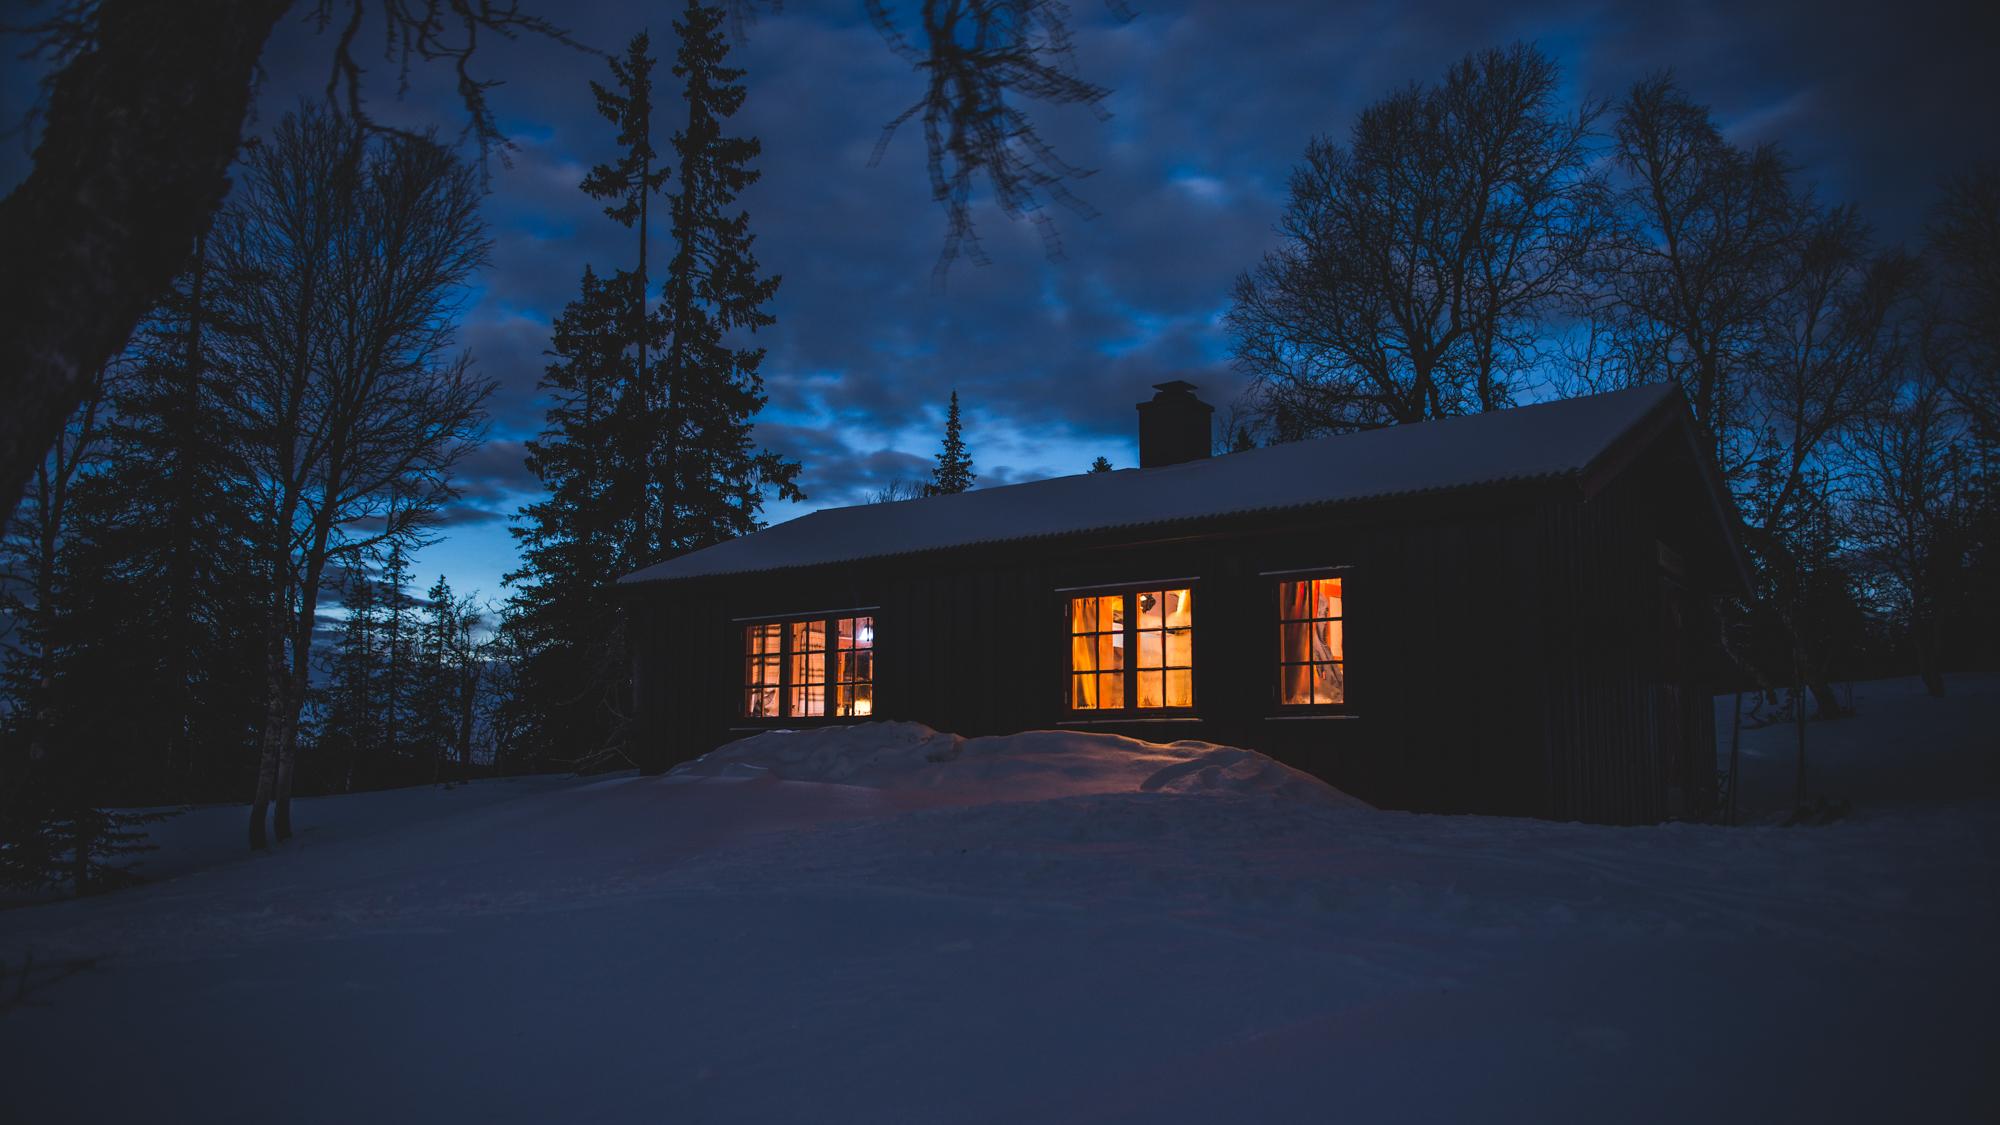 Langvasshytta - Røye og rypejakt - Snåsa fjellstyre